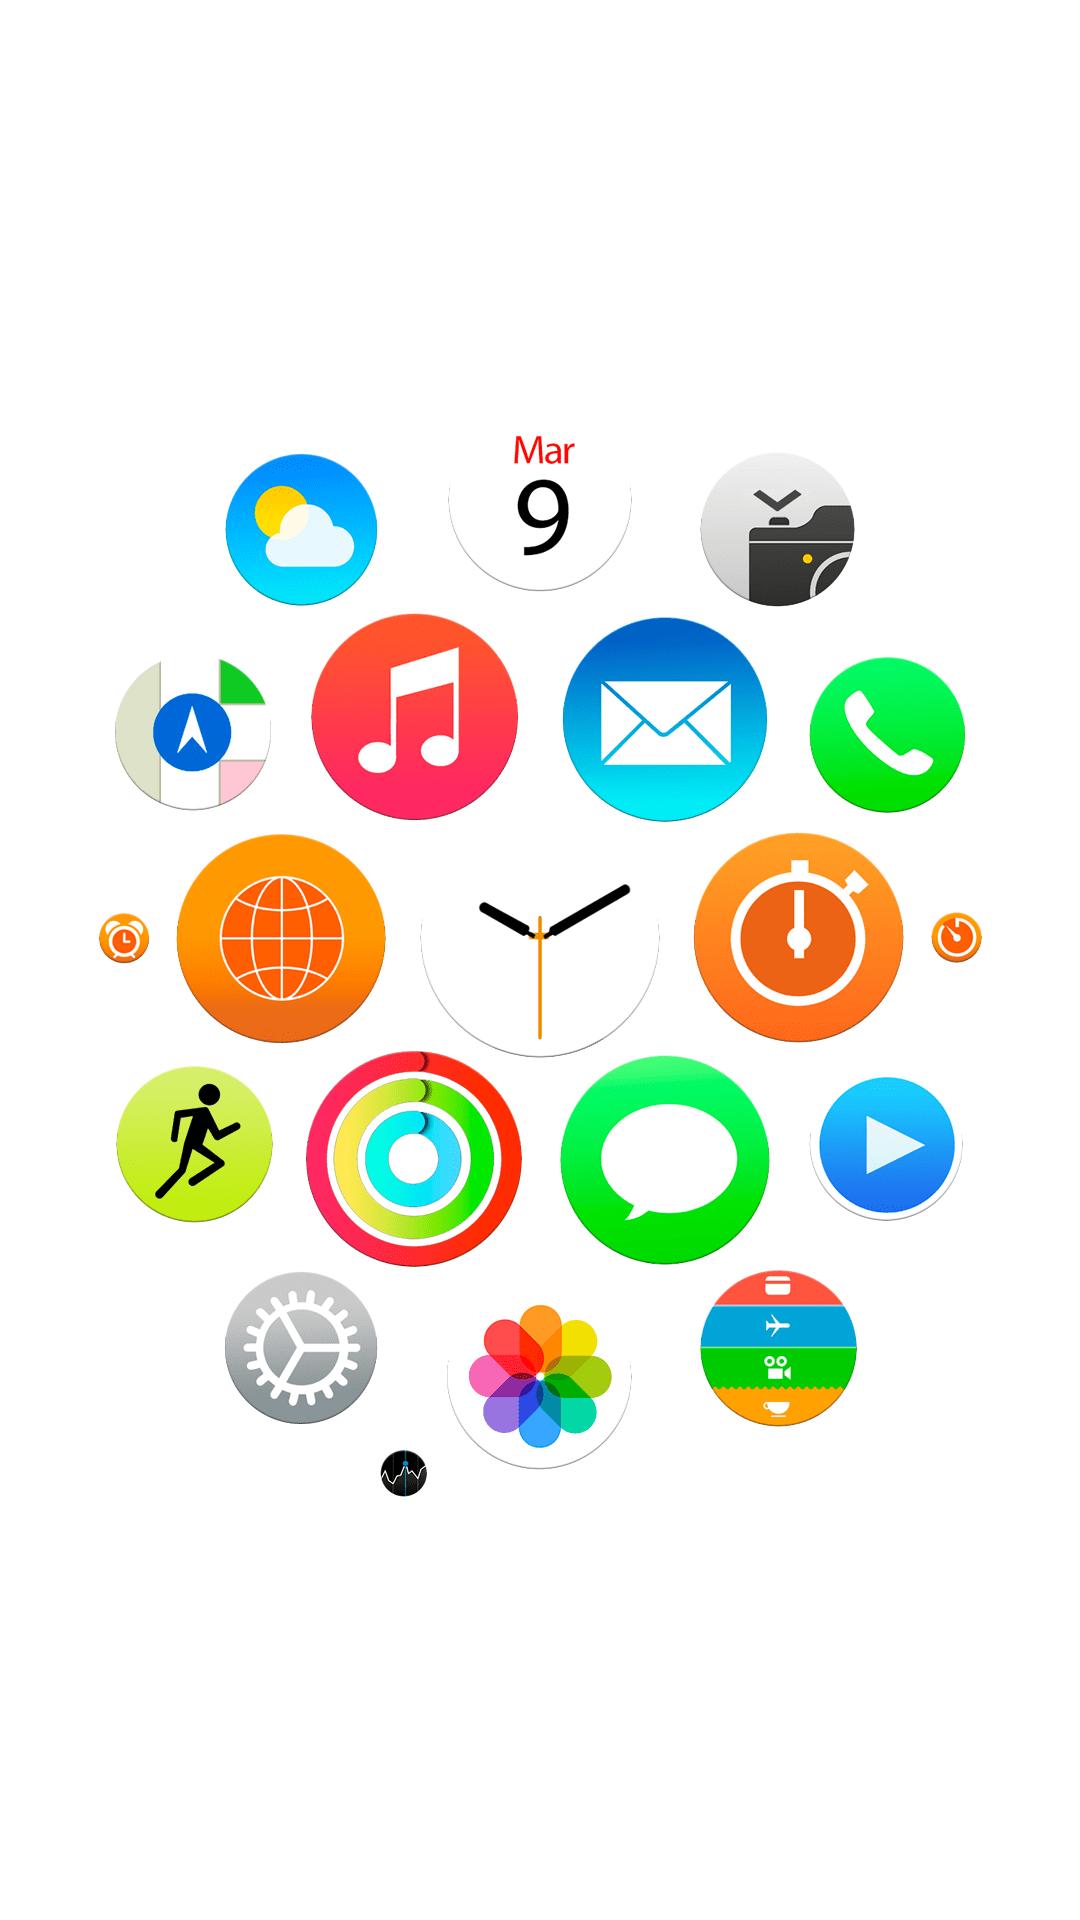 Wallpaper Lock Screen Iphone 7 Apple Watch App Icons Wallpapers For Iphone Ipad And Desktop